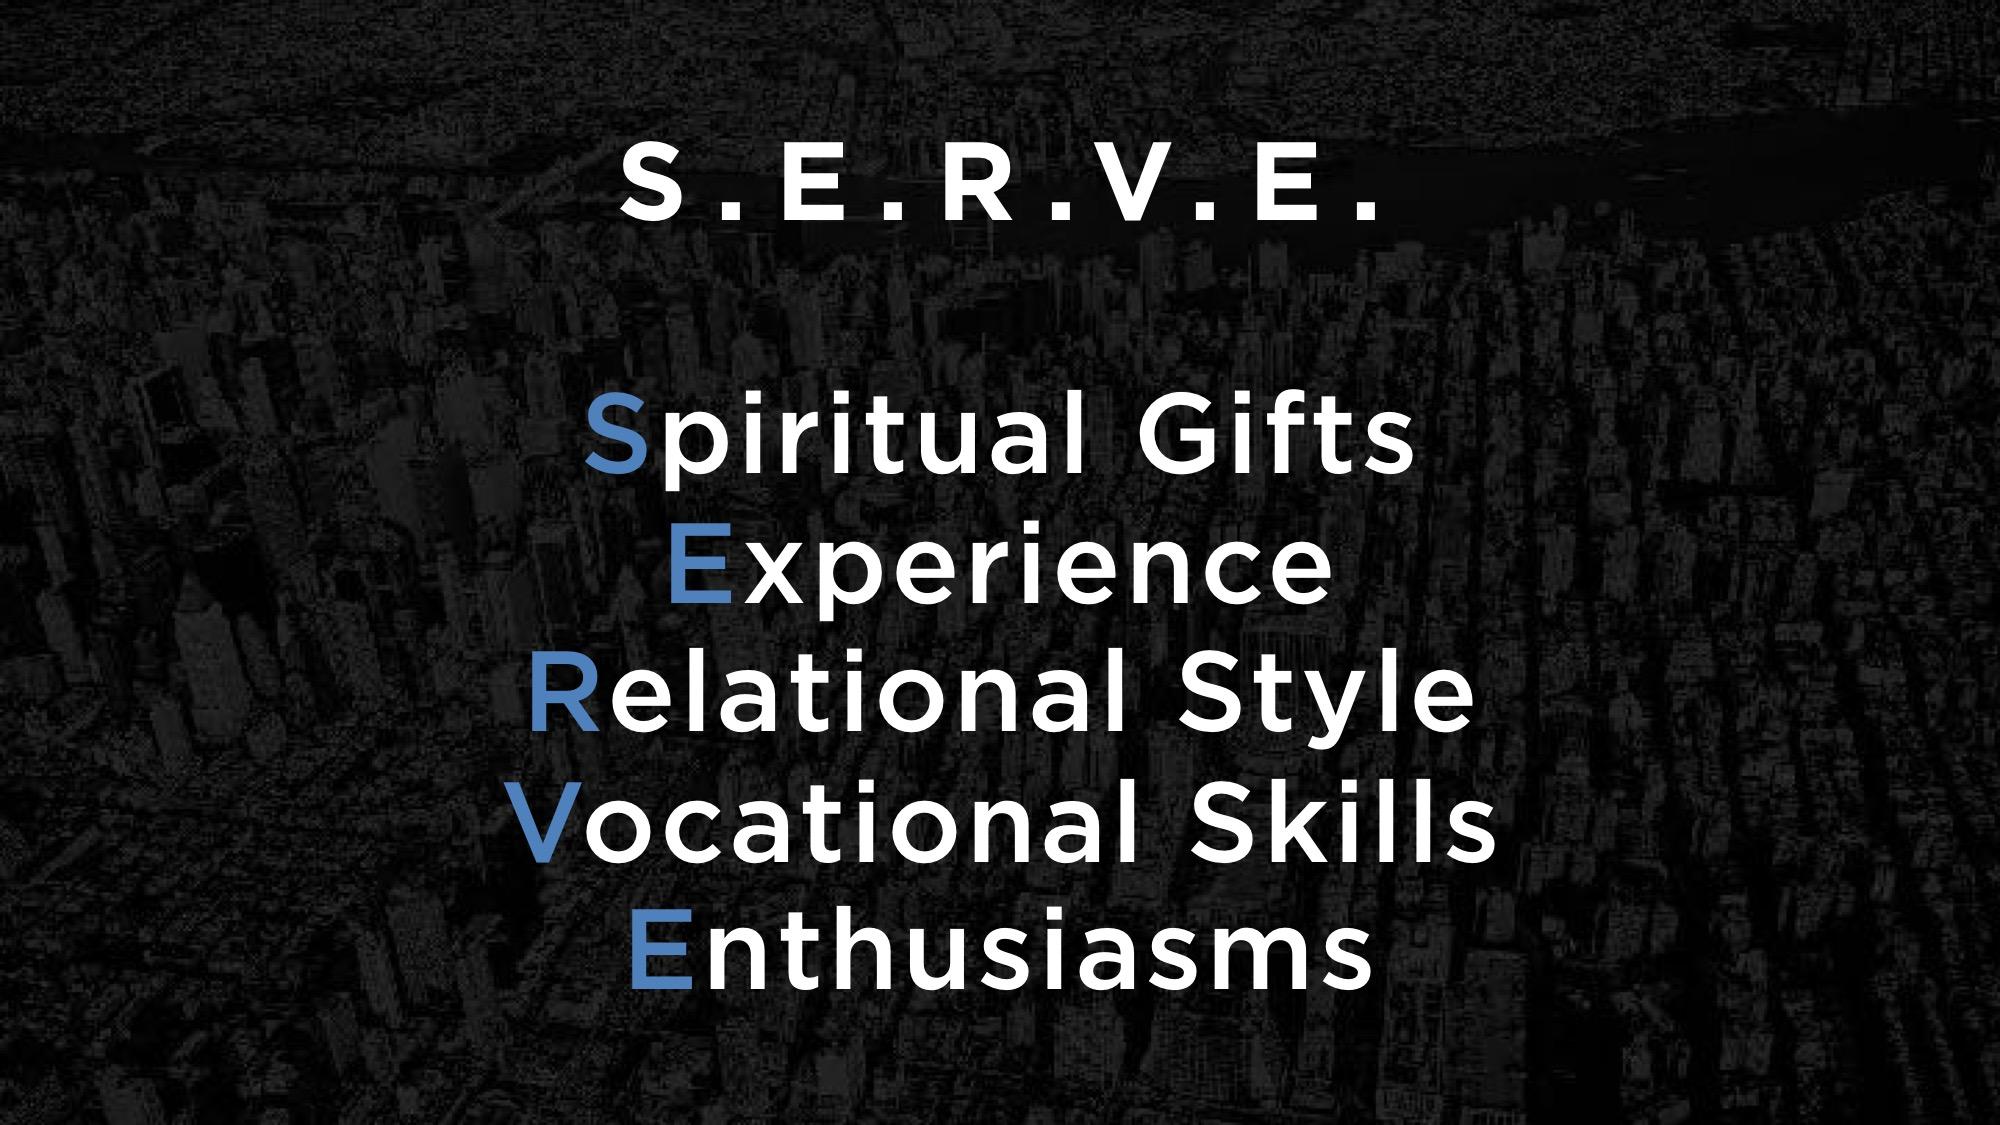 2017-09-24 - Serve Course - Week 2 (Suzy Silk) 6.jpeg